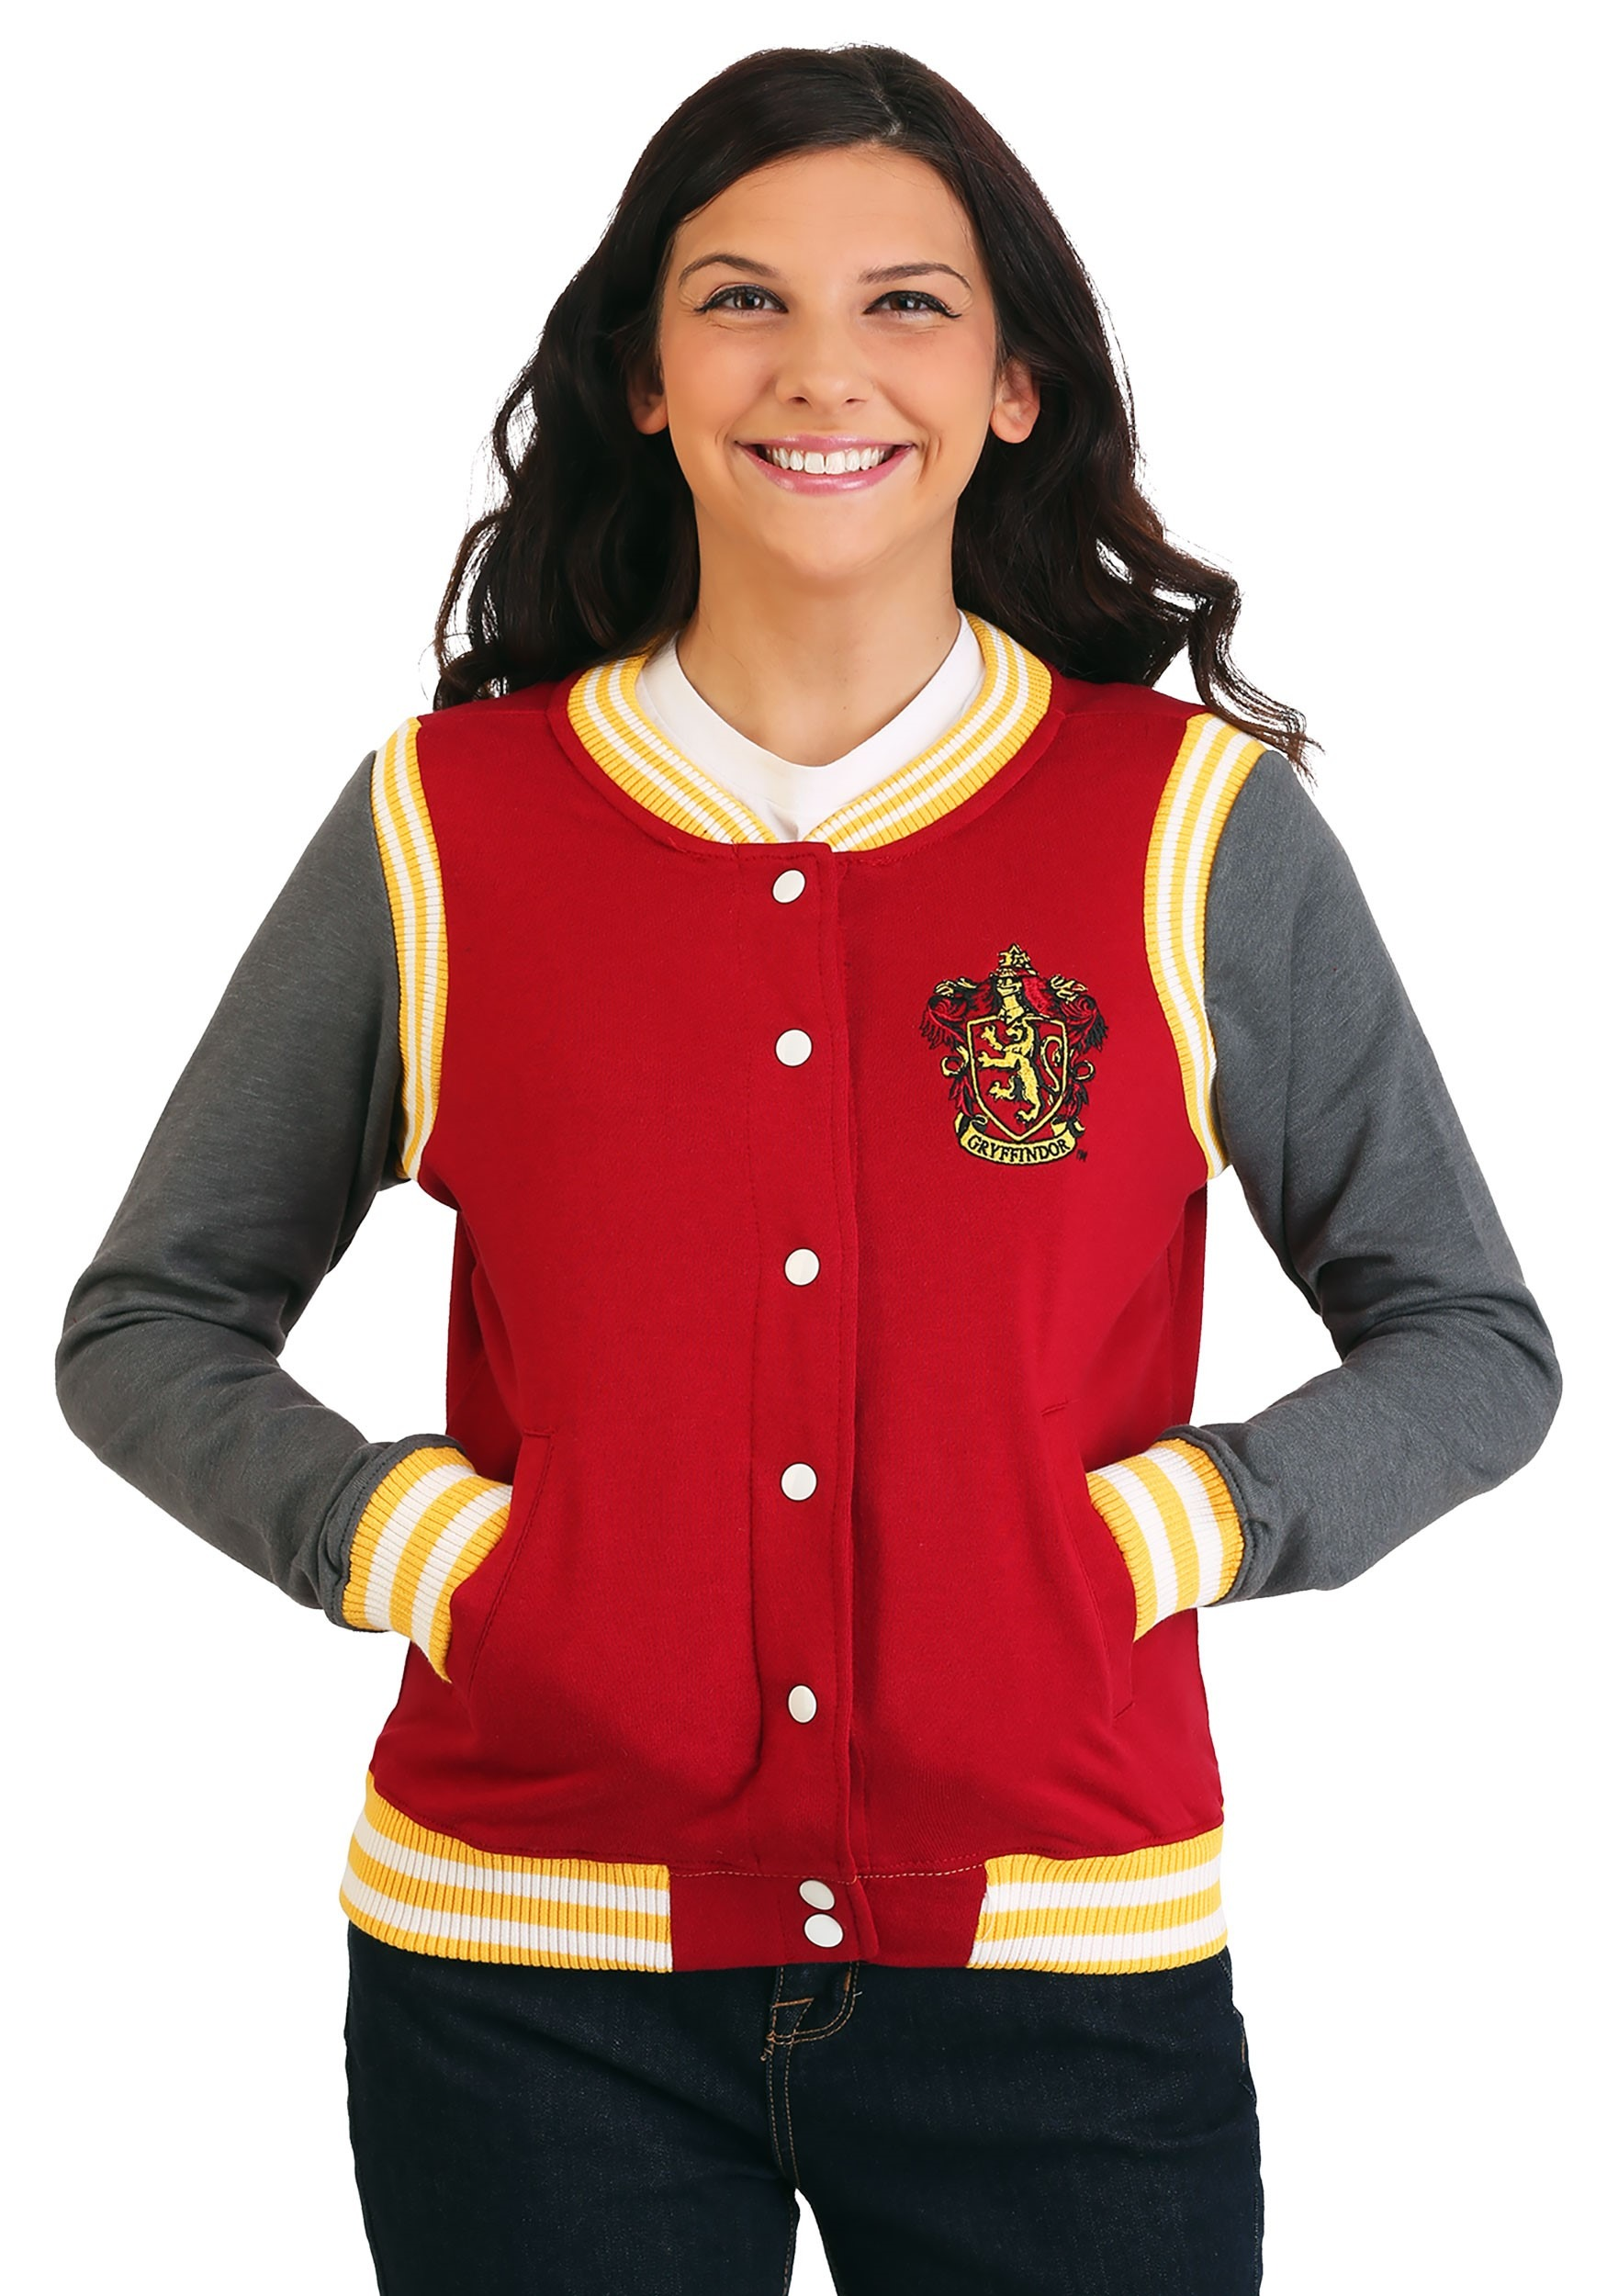 Harry Potter Gryffindor Womens Varsity Letterman Jacket